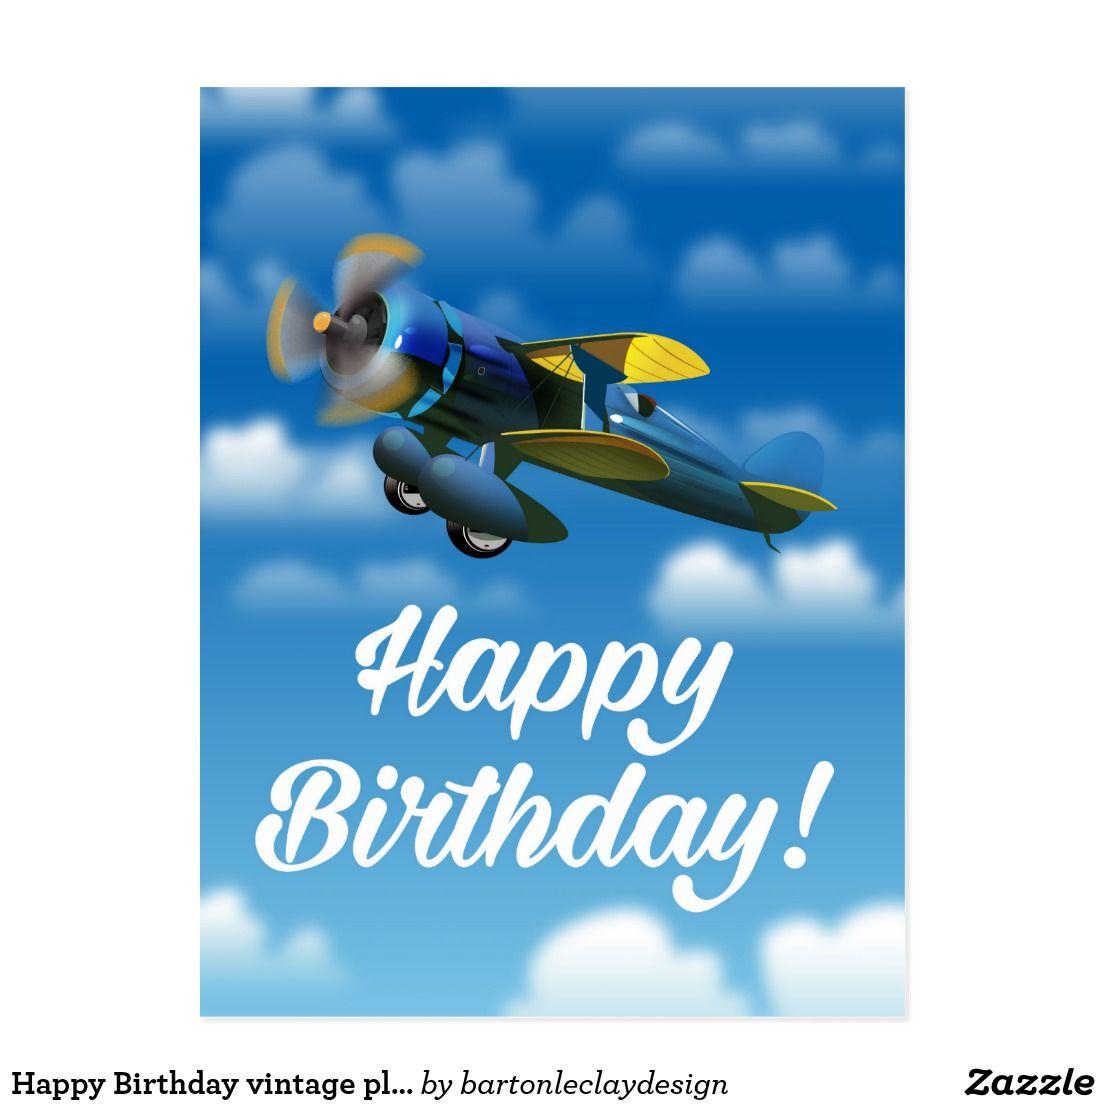 Happy Birthday Vintage Plane In A Blue Sky Postcard Zazzle Com